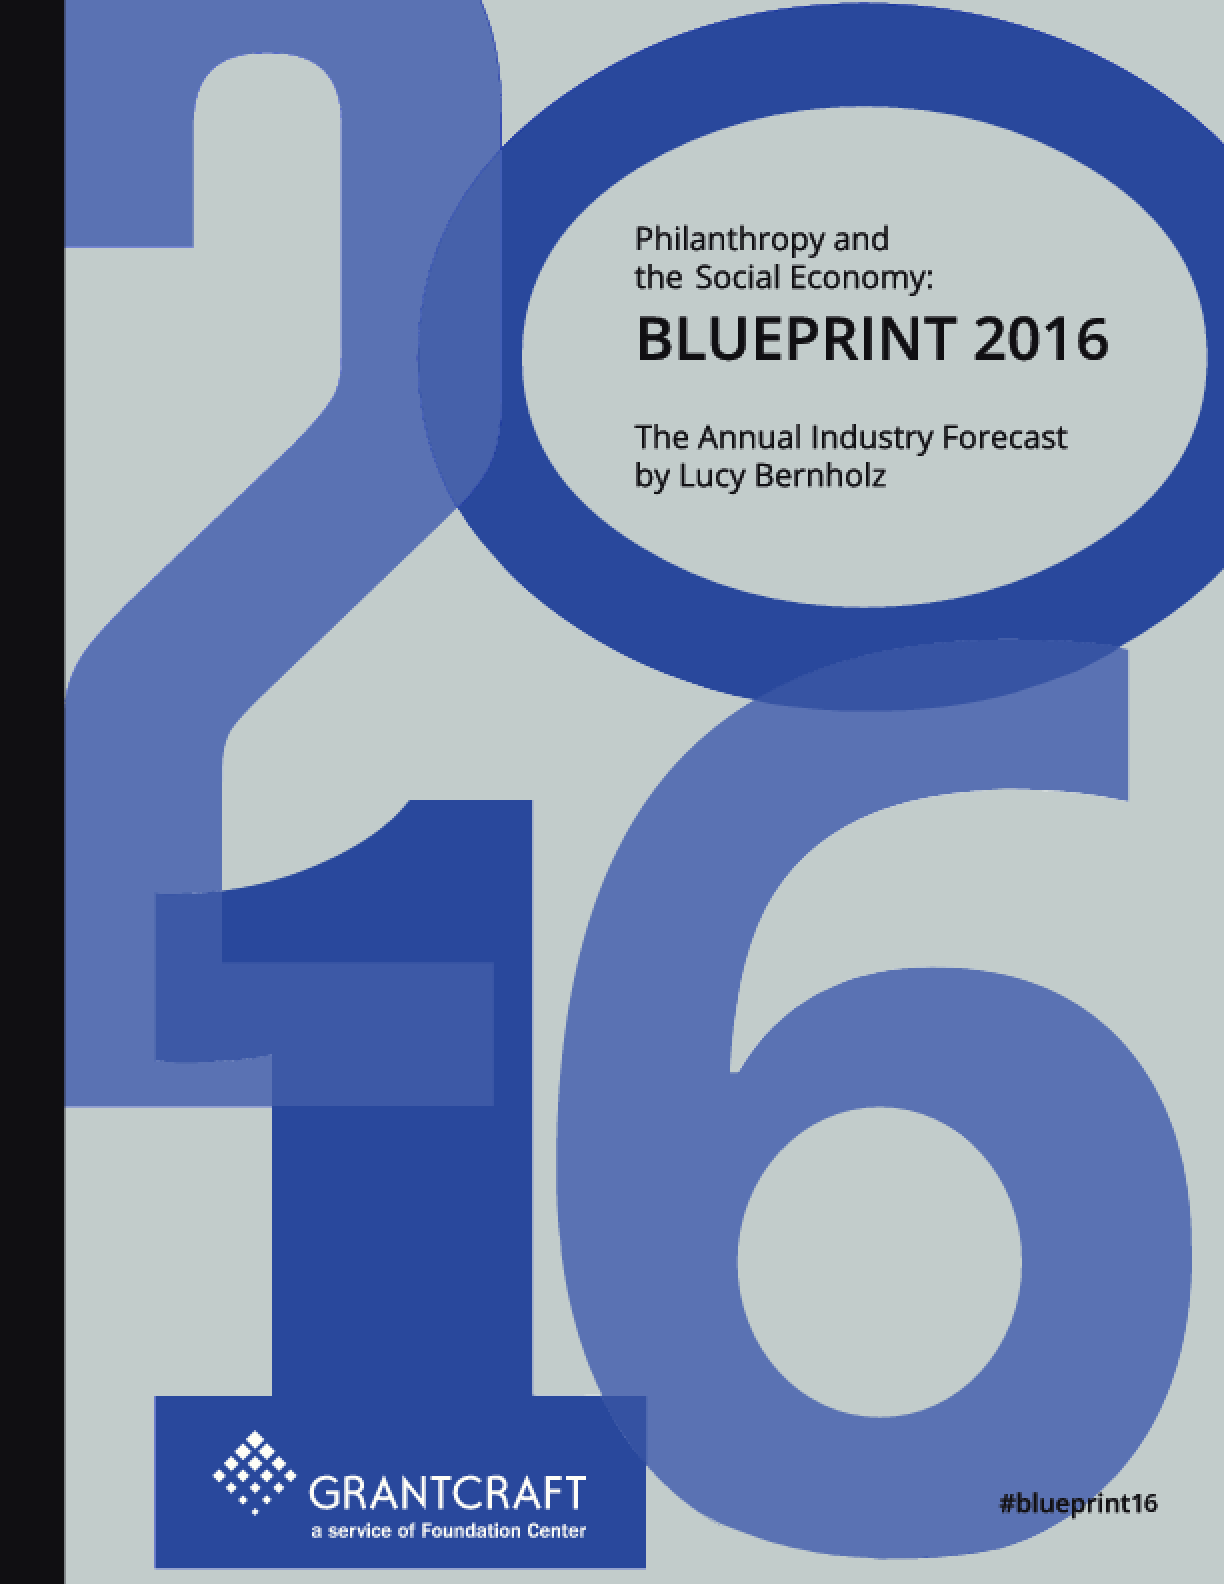 Philanthropy and the Social Economy: Blueprint 2016